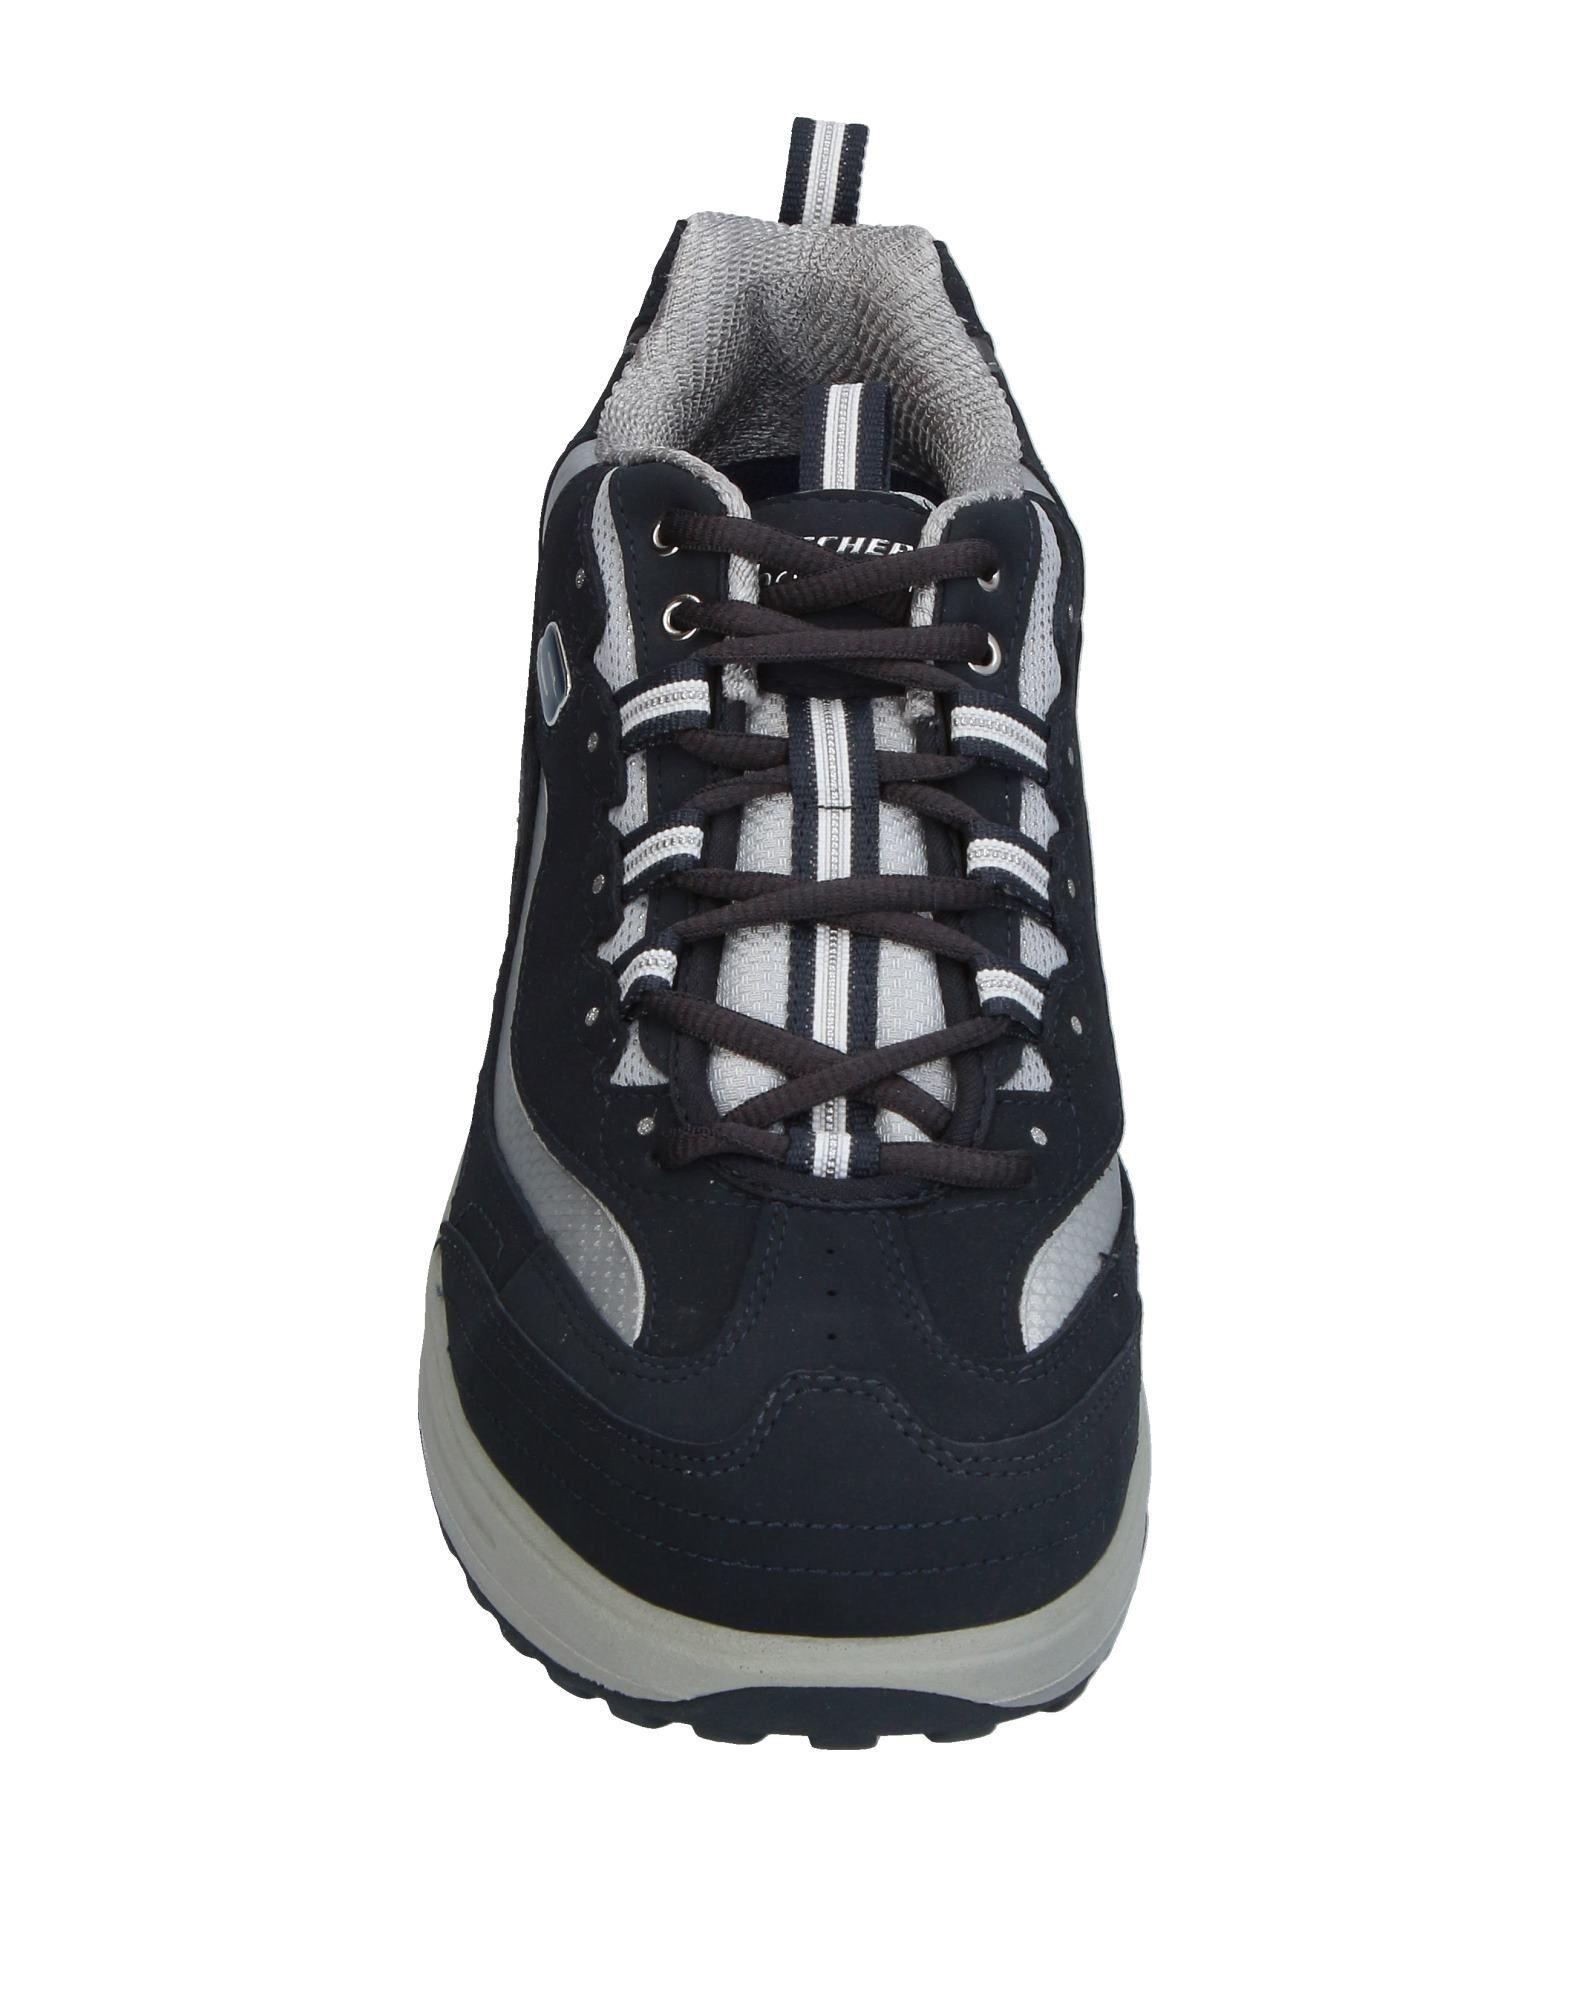 Skechers Low-tops & Sneakers in Steel Grey (Grey)